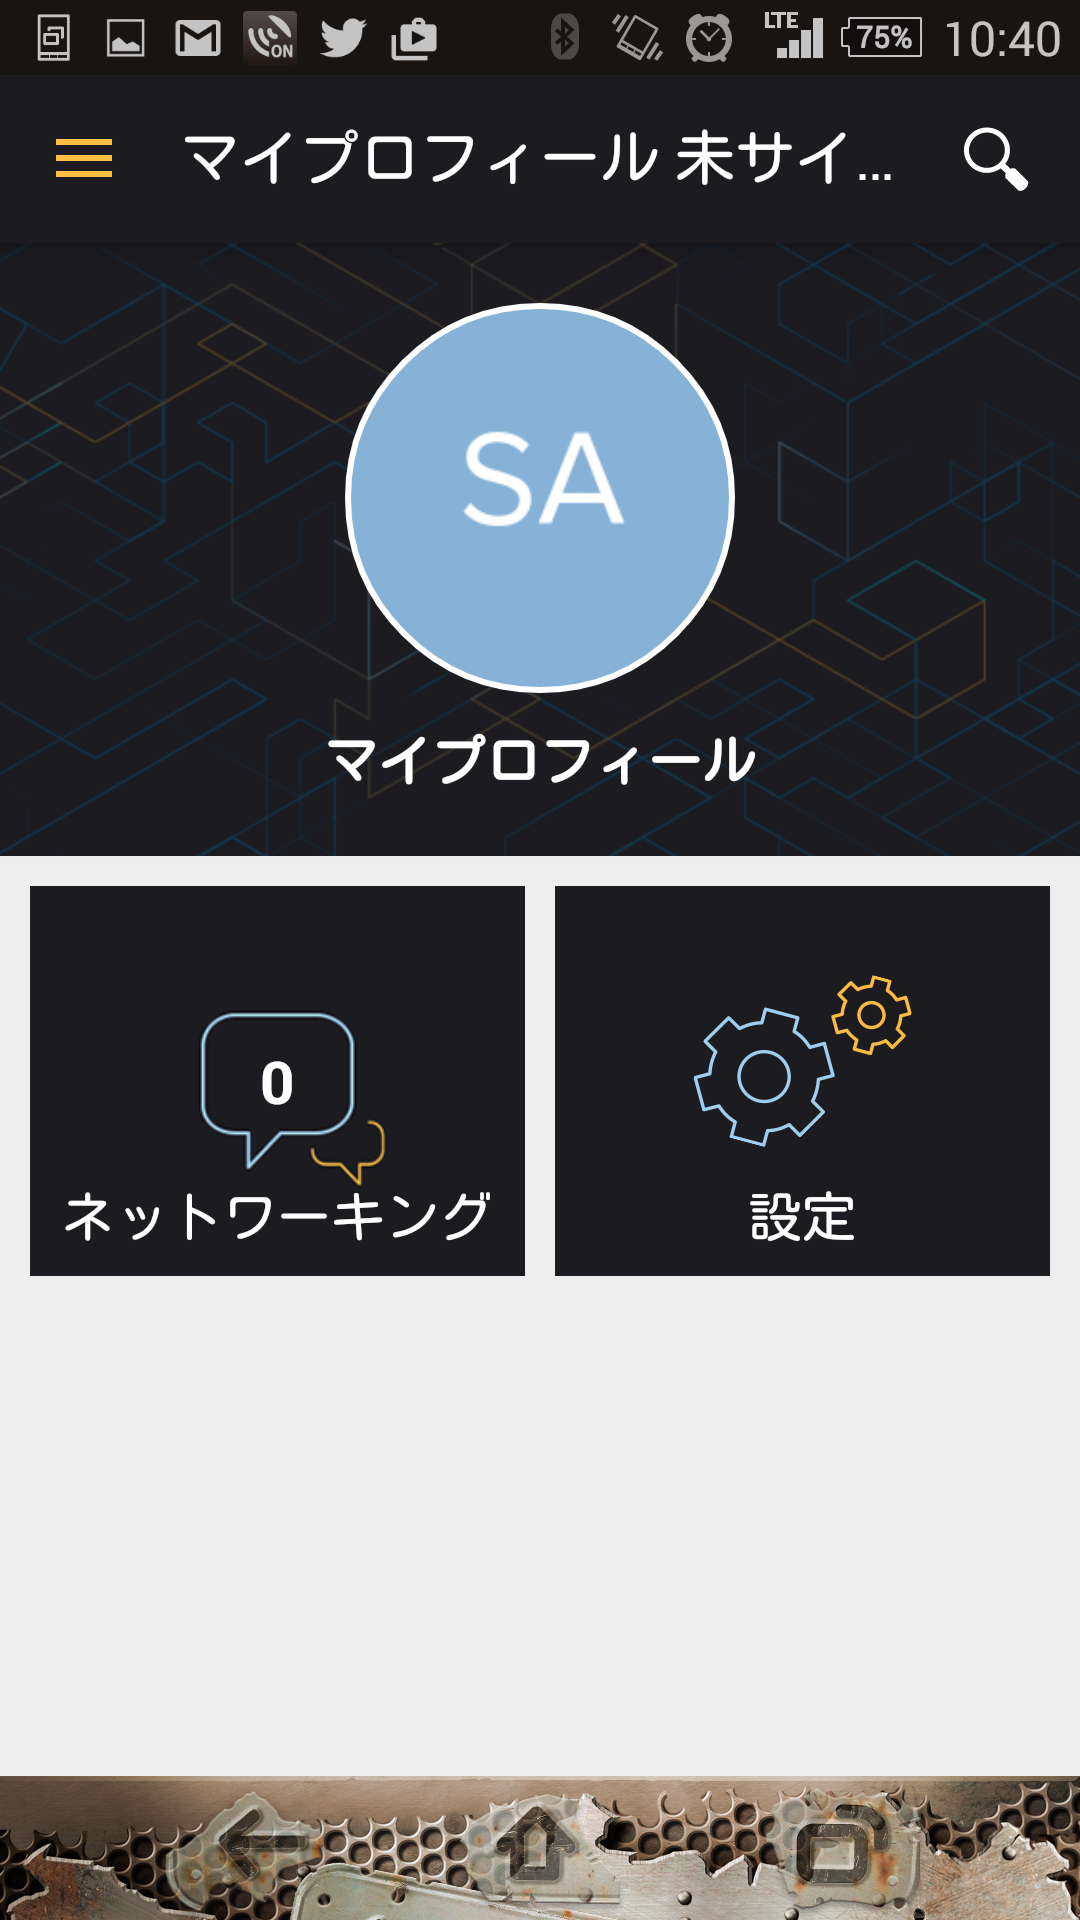 aws-reinvent-2015-event-app_06